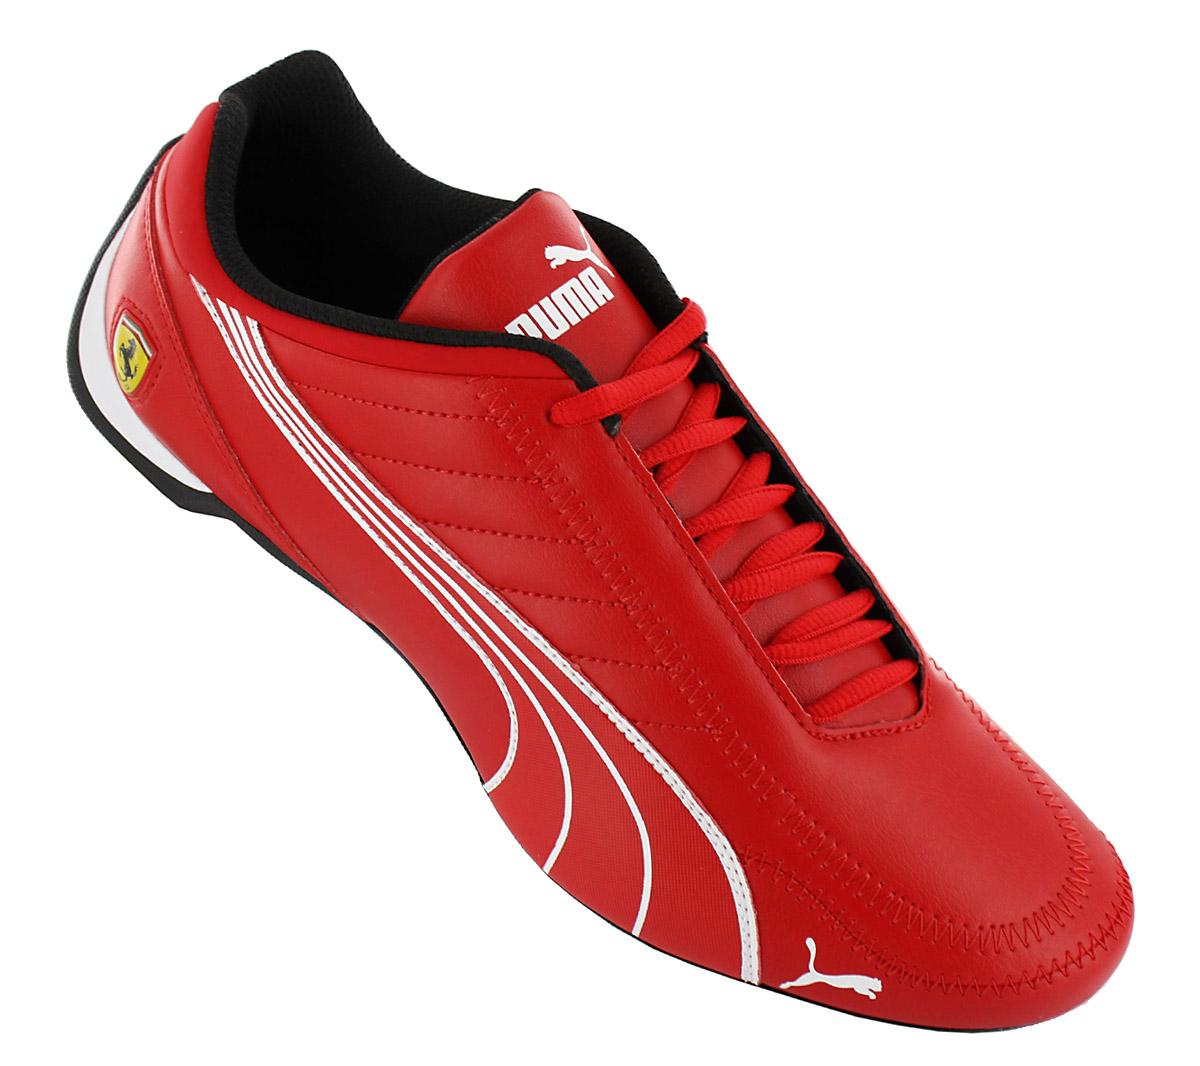 Uomo Rosso Sf Puma Kart Qpqbaz Cat Sneaker Ferrari Future Scarpe Go XNnOPw80k